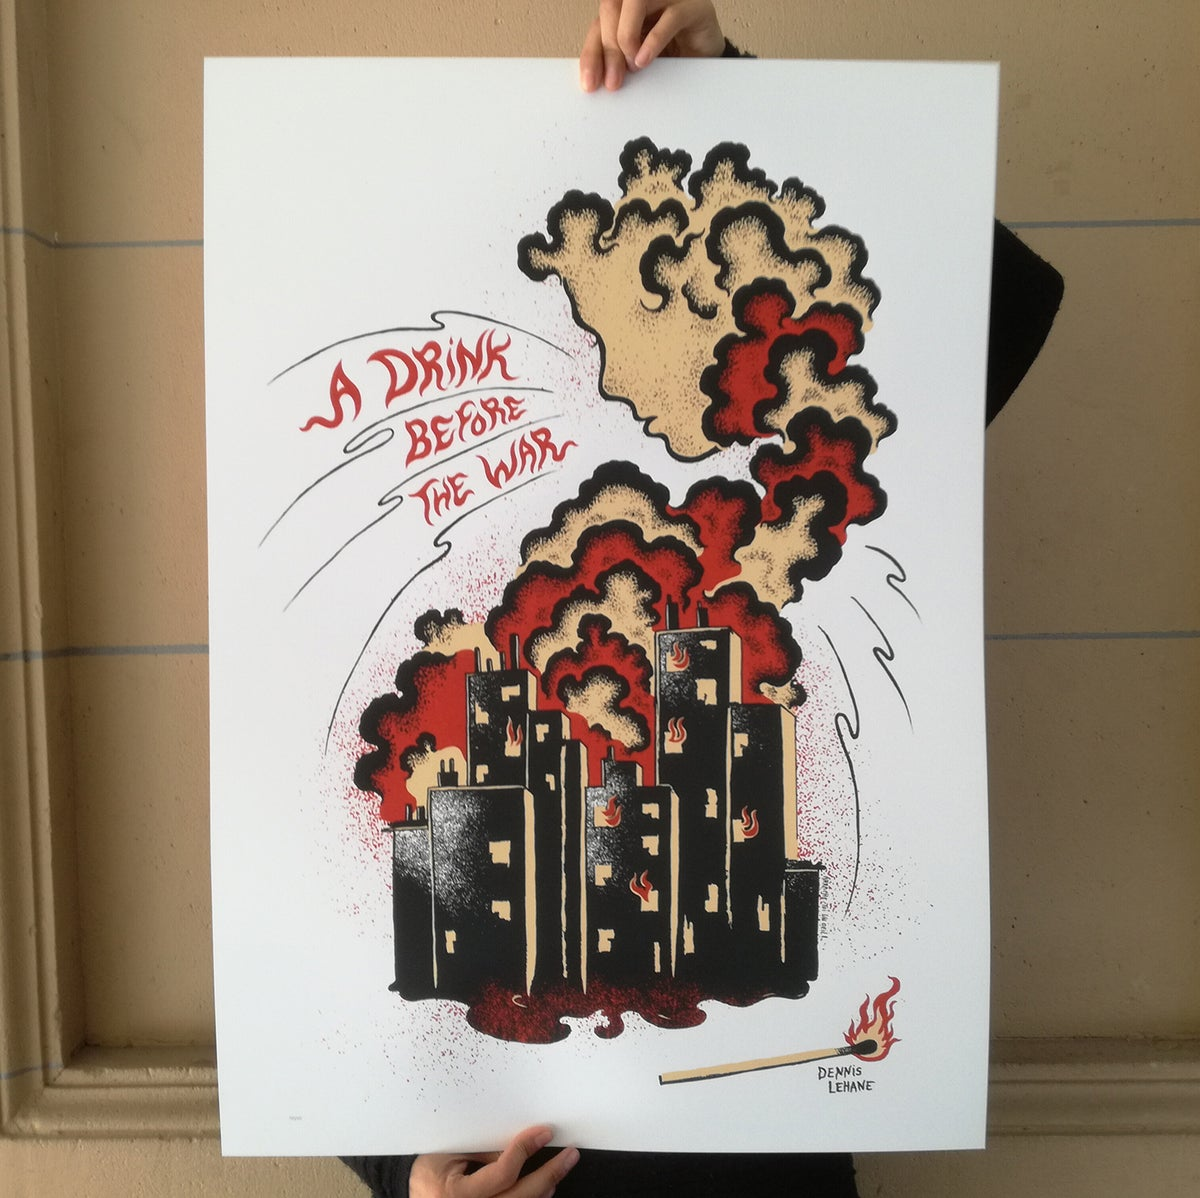 A DRINK BEFORE THE WAR, Dennis Lehane (2018)